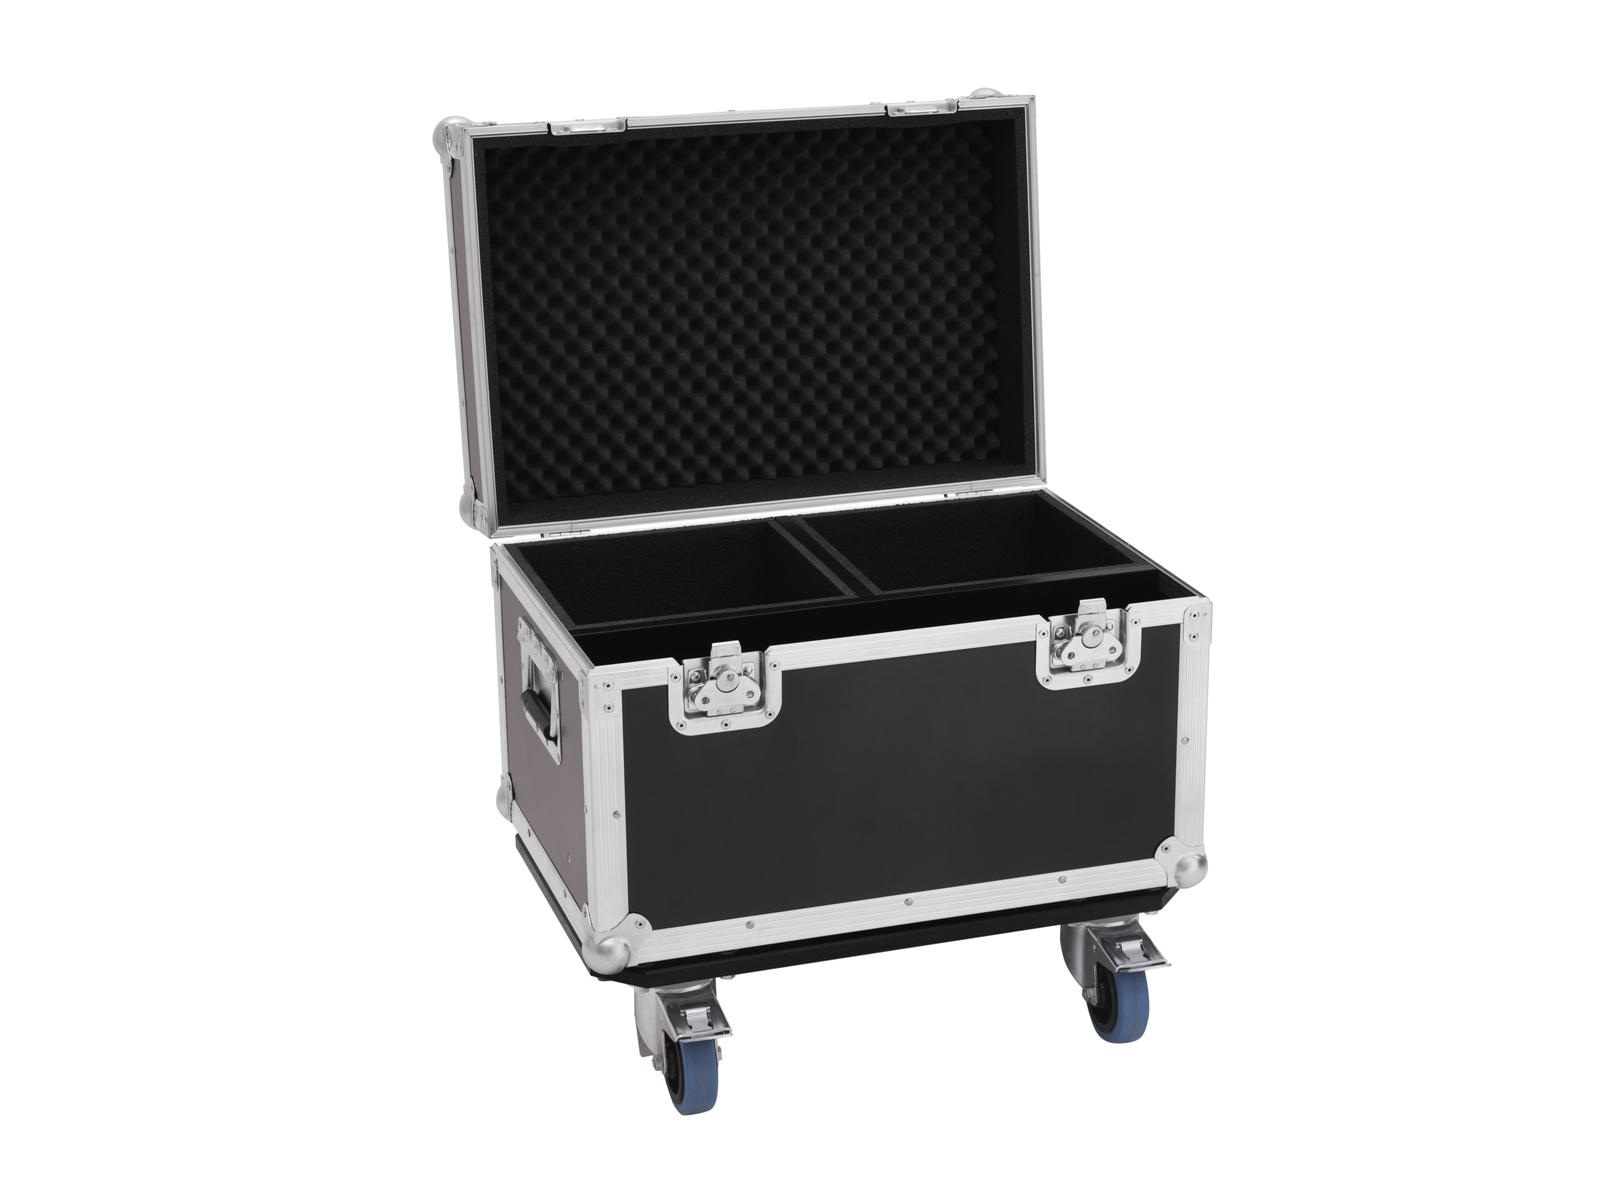 ROADINGER Flightcase PRO 2x Spark Master mit Rollen